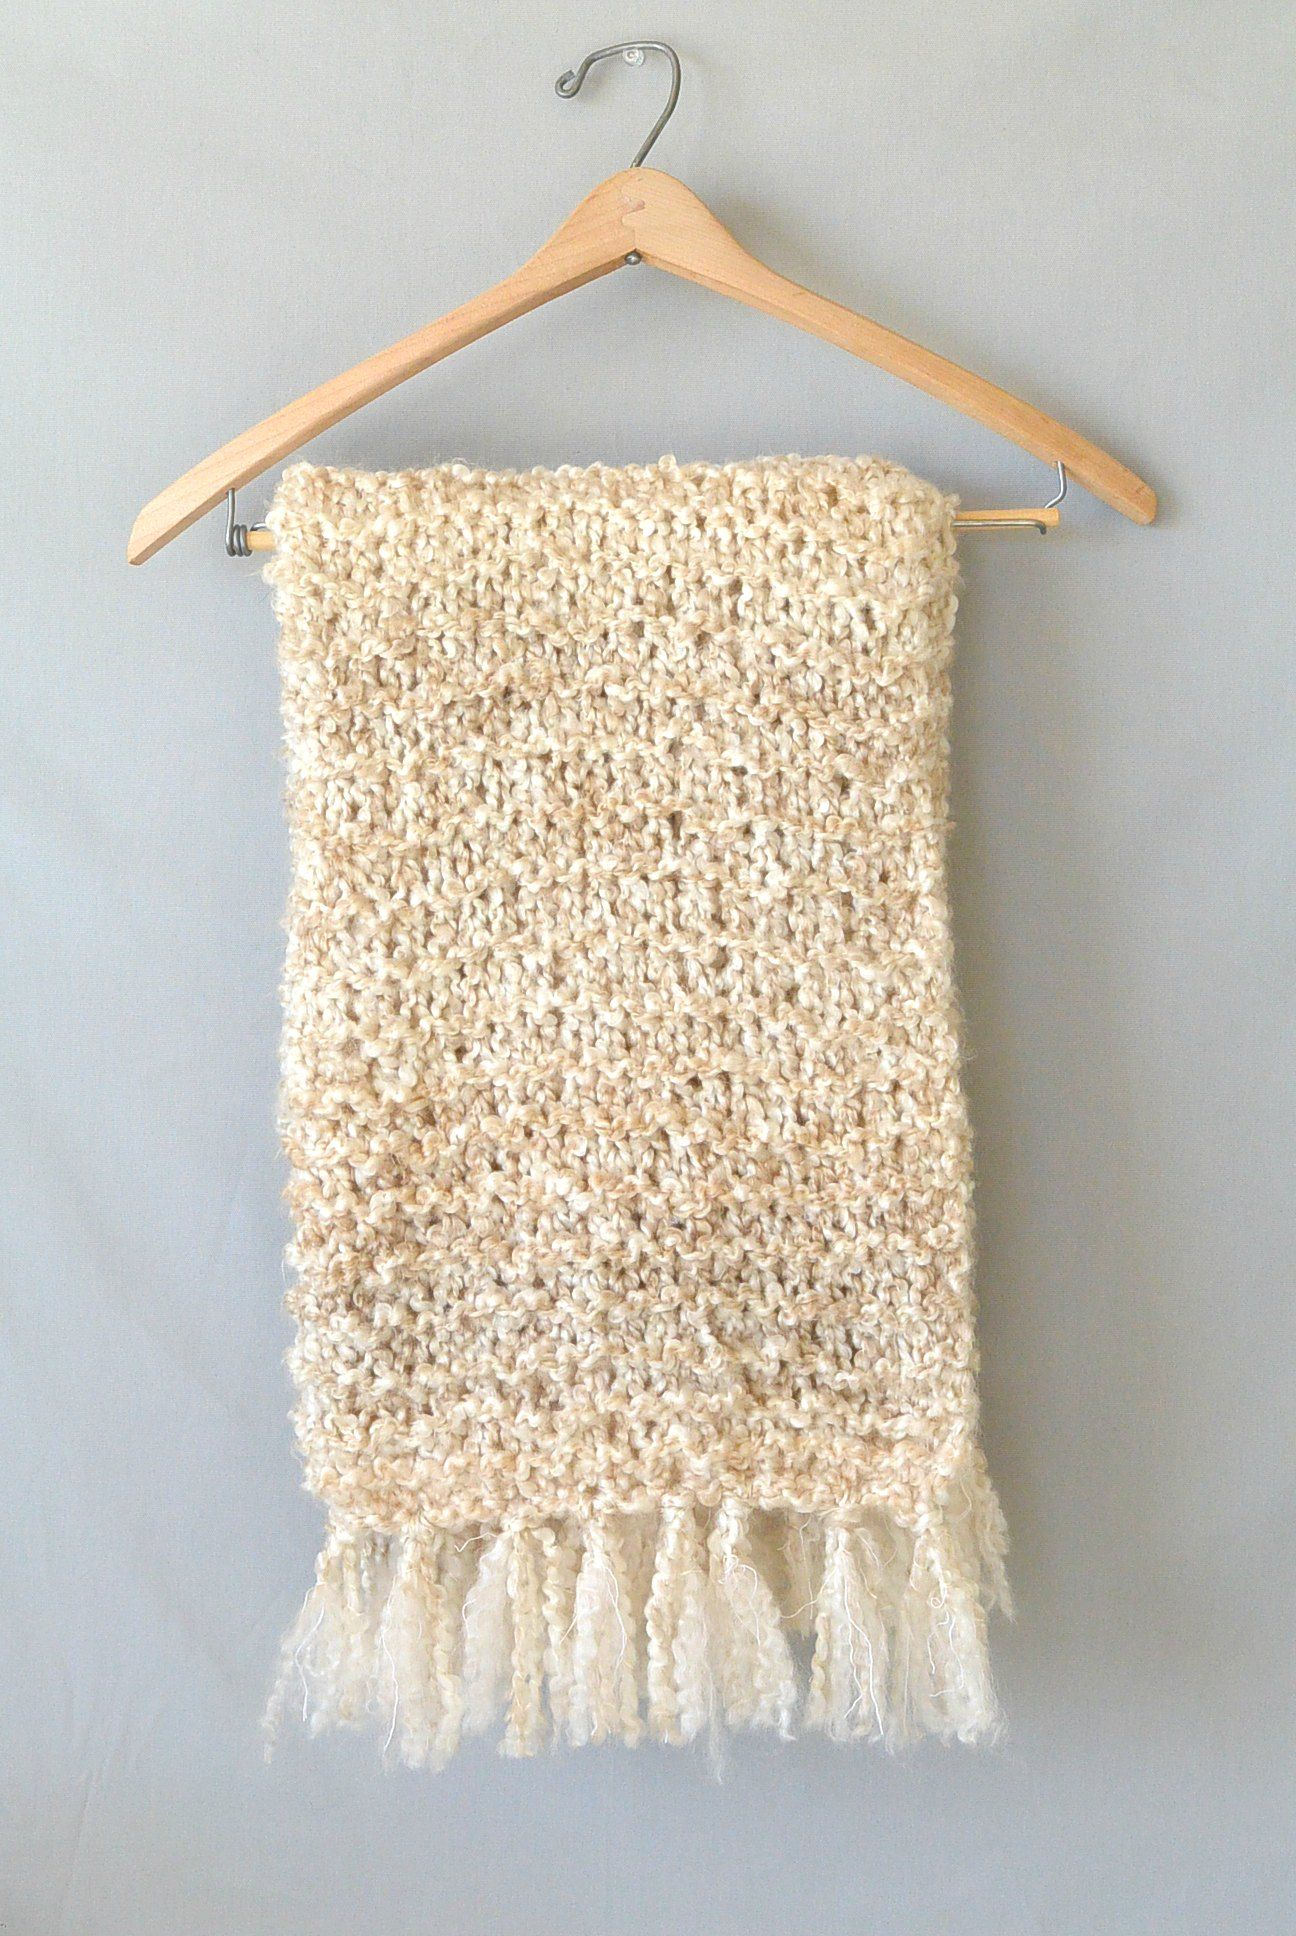 Sedona Serenity Knit Shawl Pattern | Cuellos tejidos, Chal y Puntos